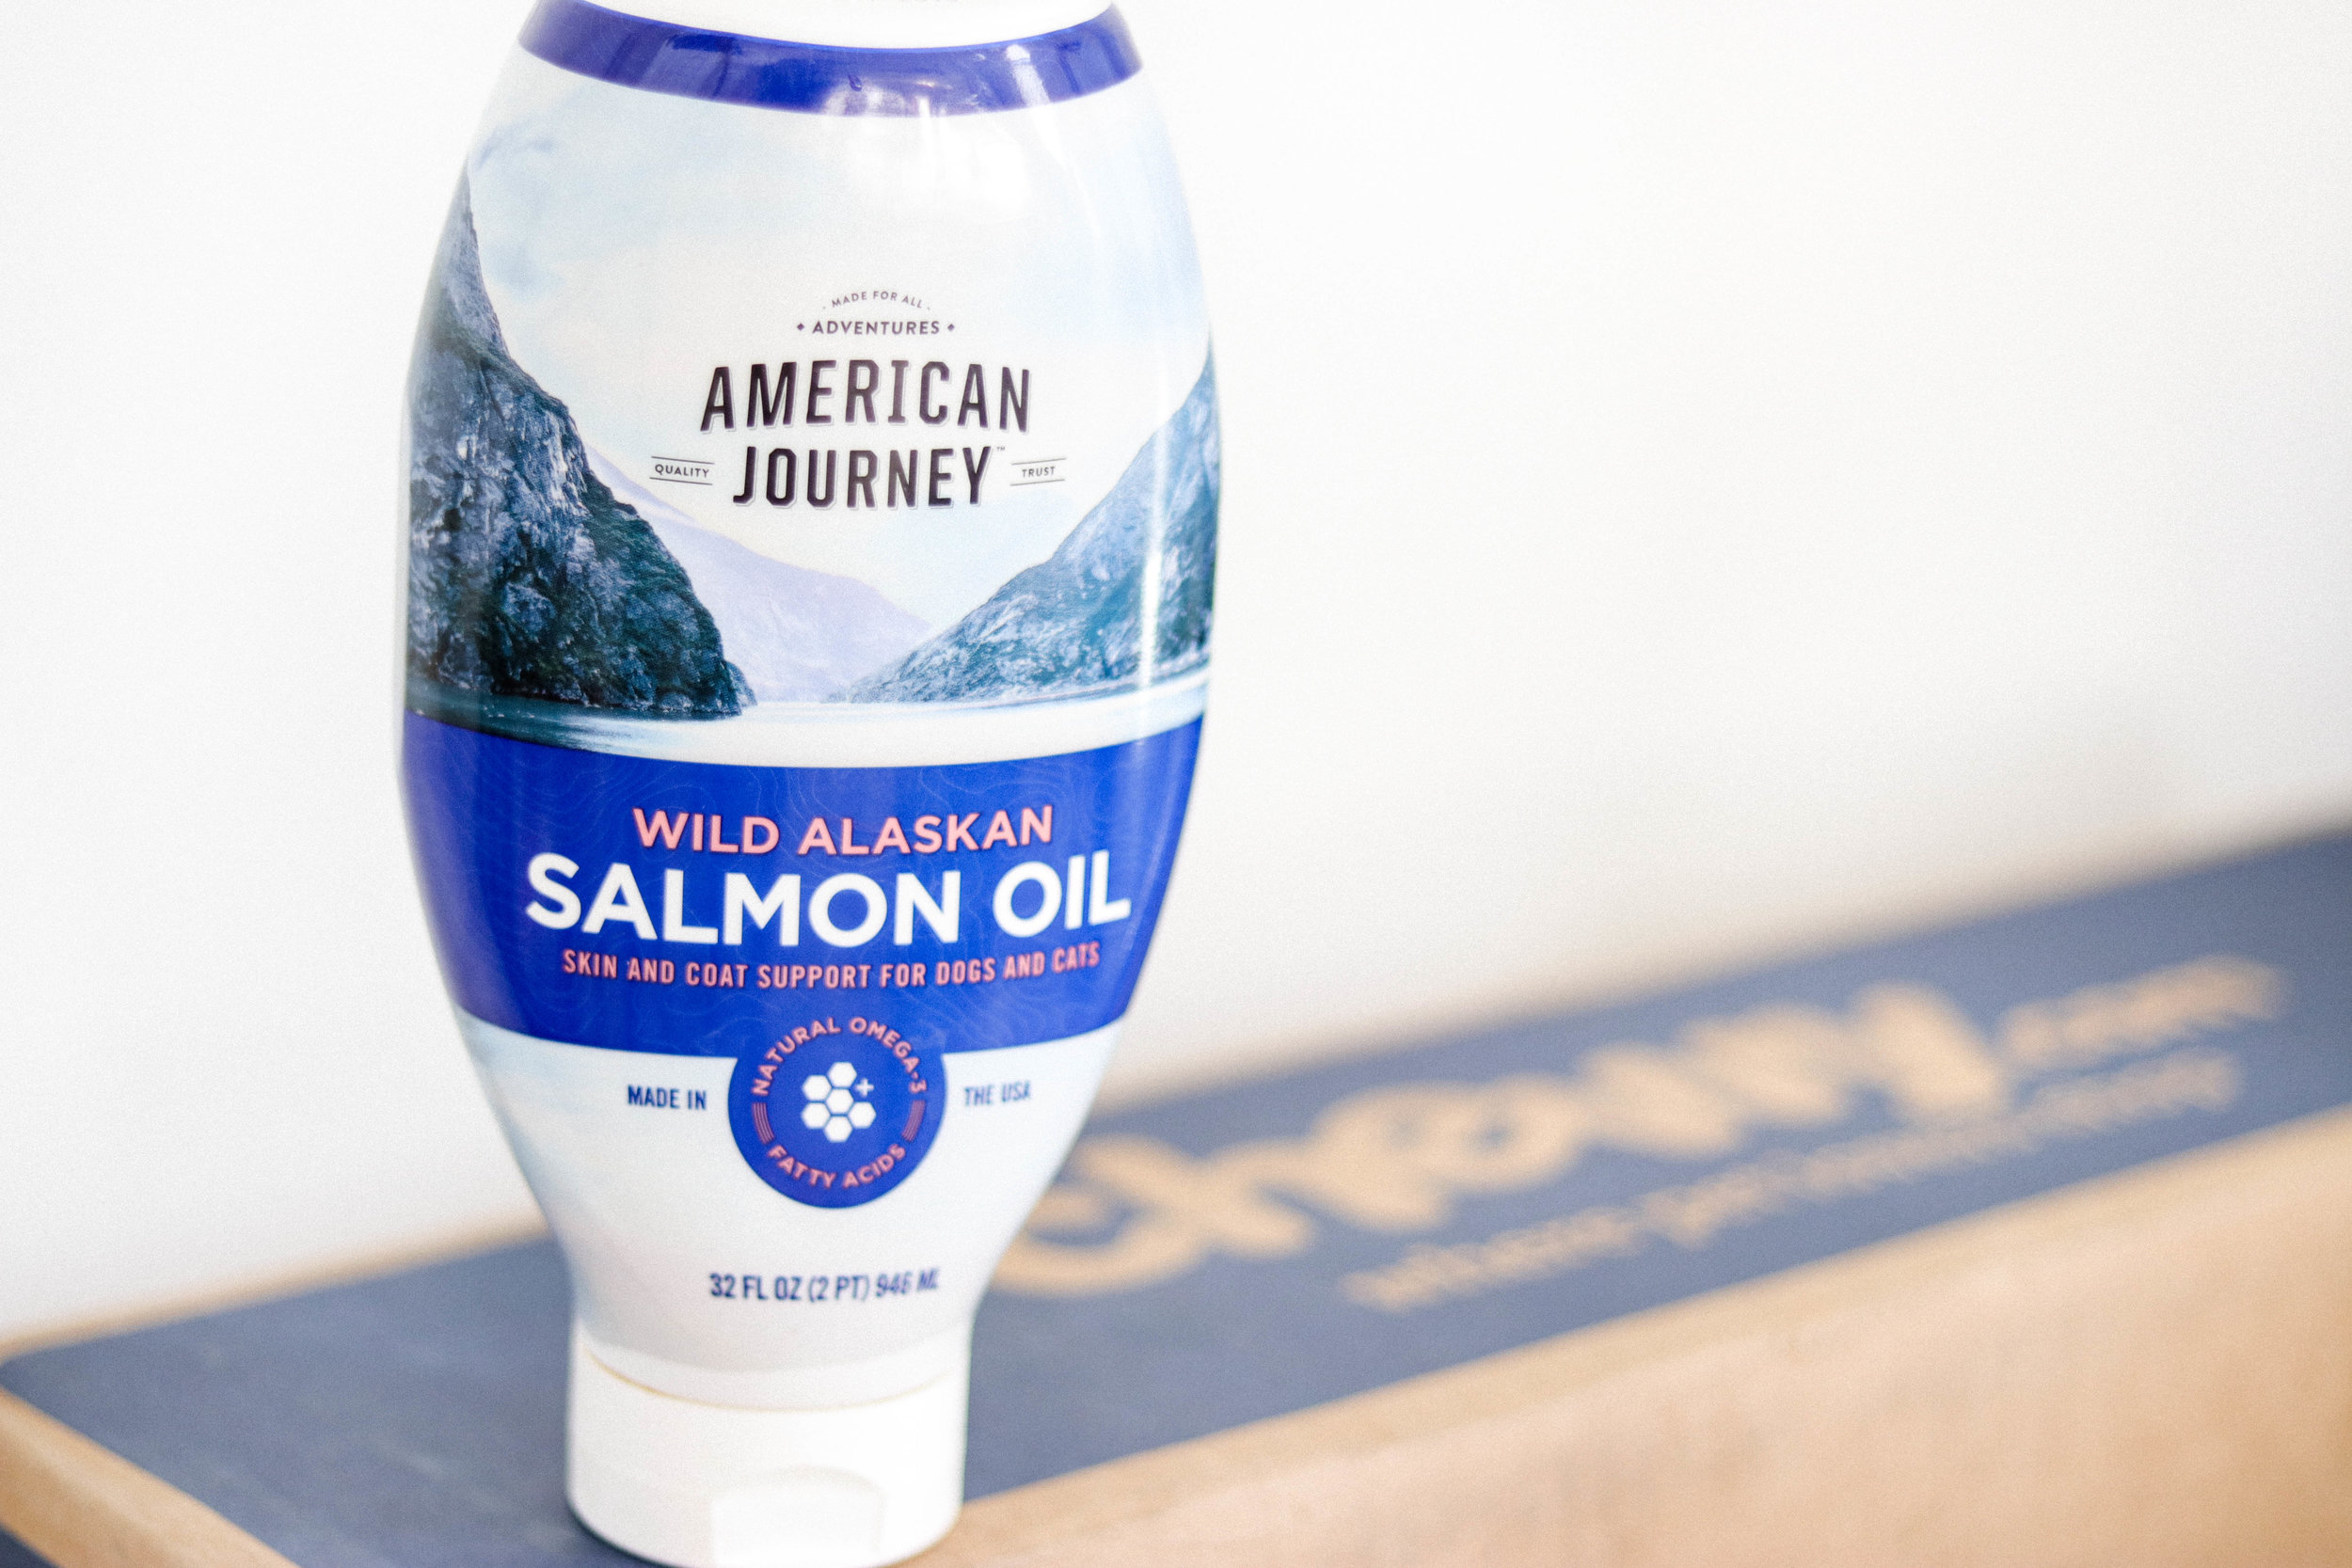 American Journey - Wild Alaskan Salmon Oil